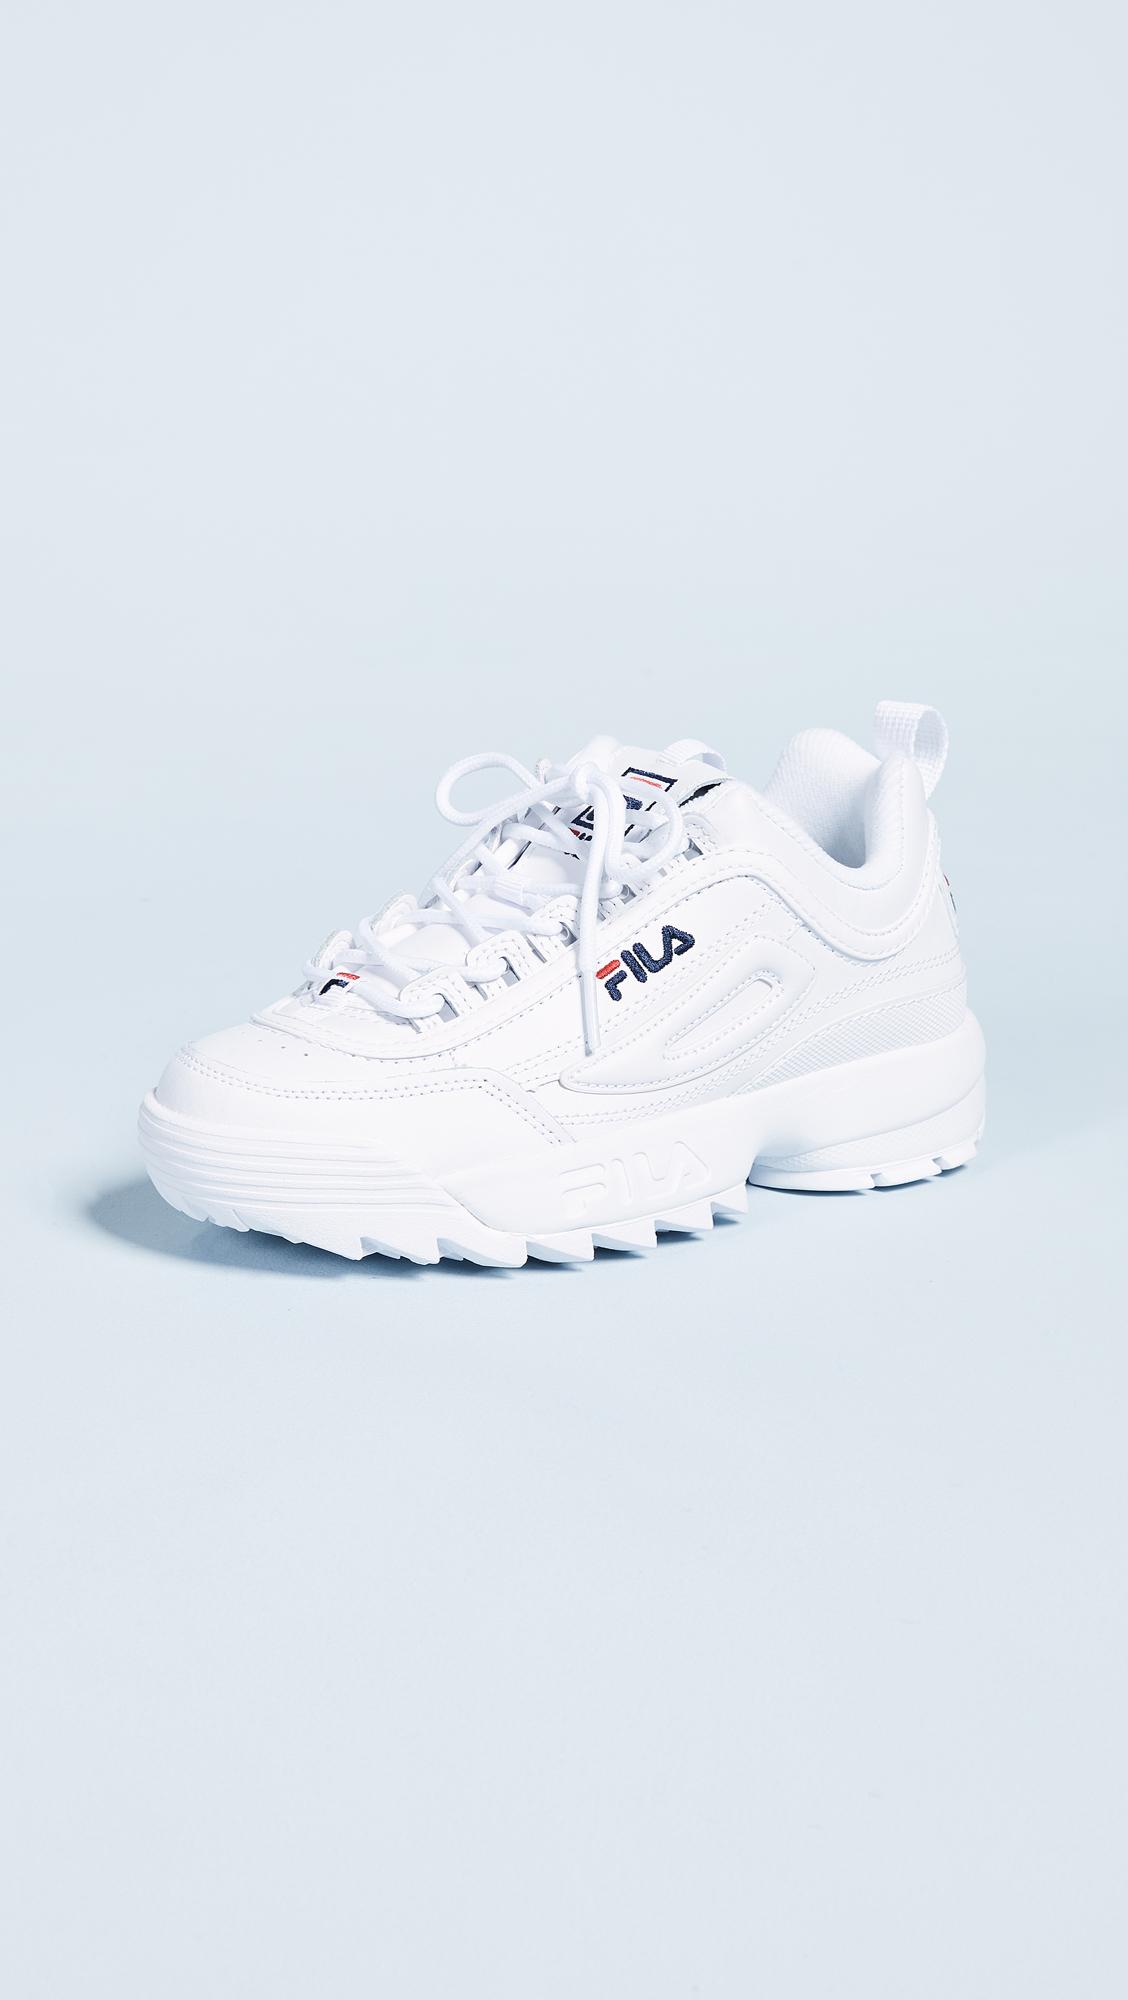 Fila Disruptor II Premium Sneakers | SHOPBOP